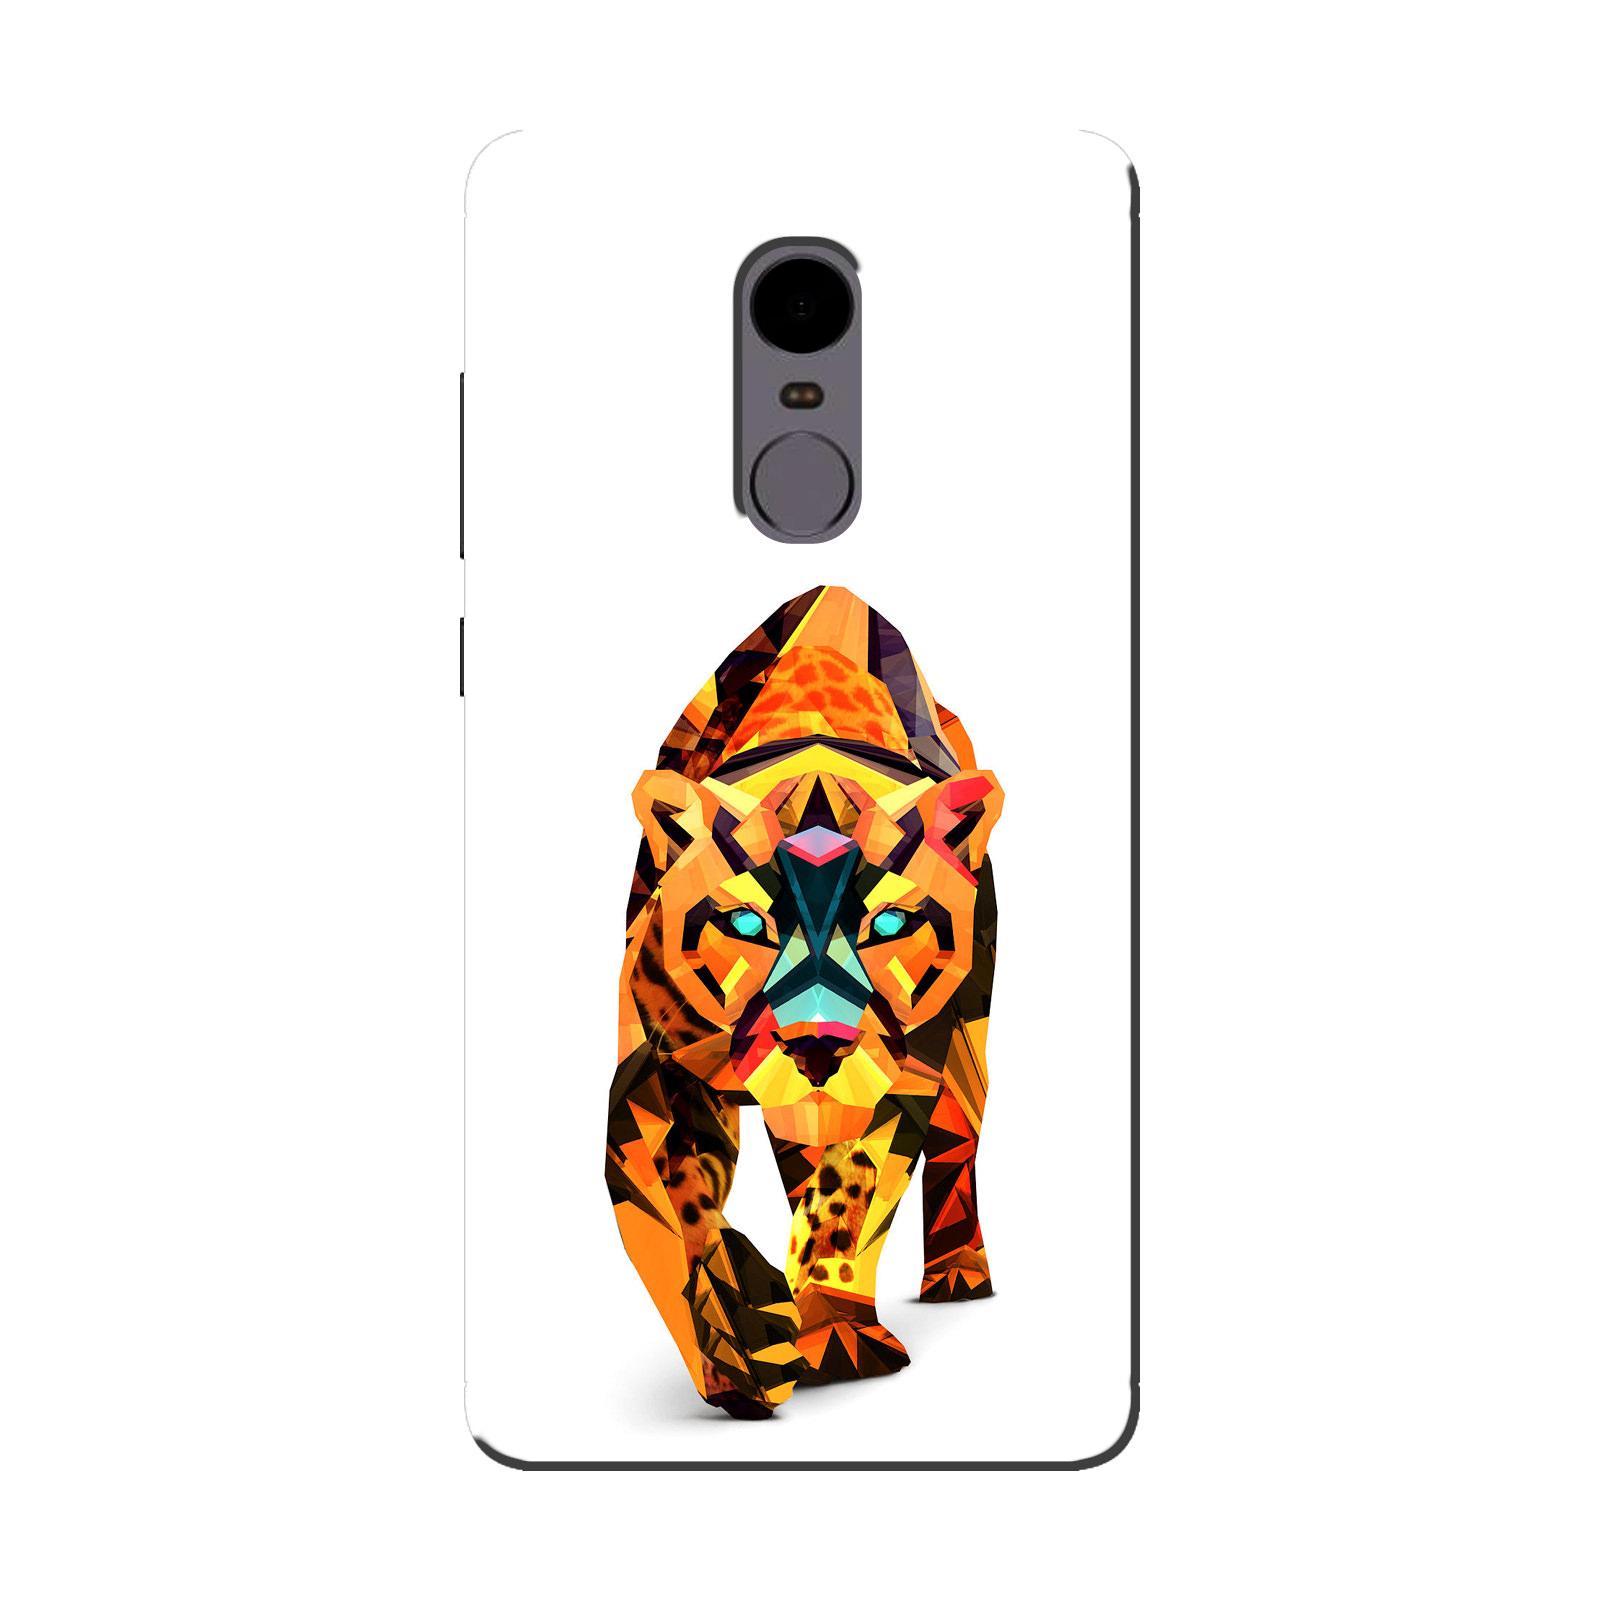 sairafashions Wild Thunder Mi Redmi Note 4 Mobile Back Cover Case And Designer Printed Hard Flexible Mobile Case Cover  - 1156